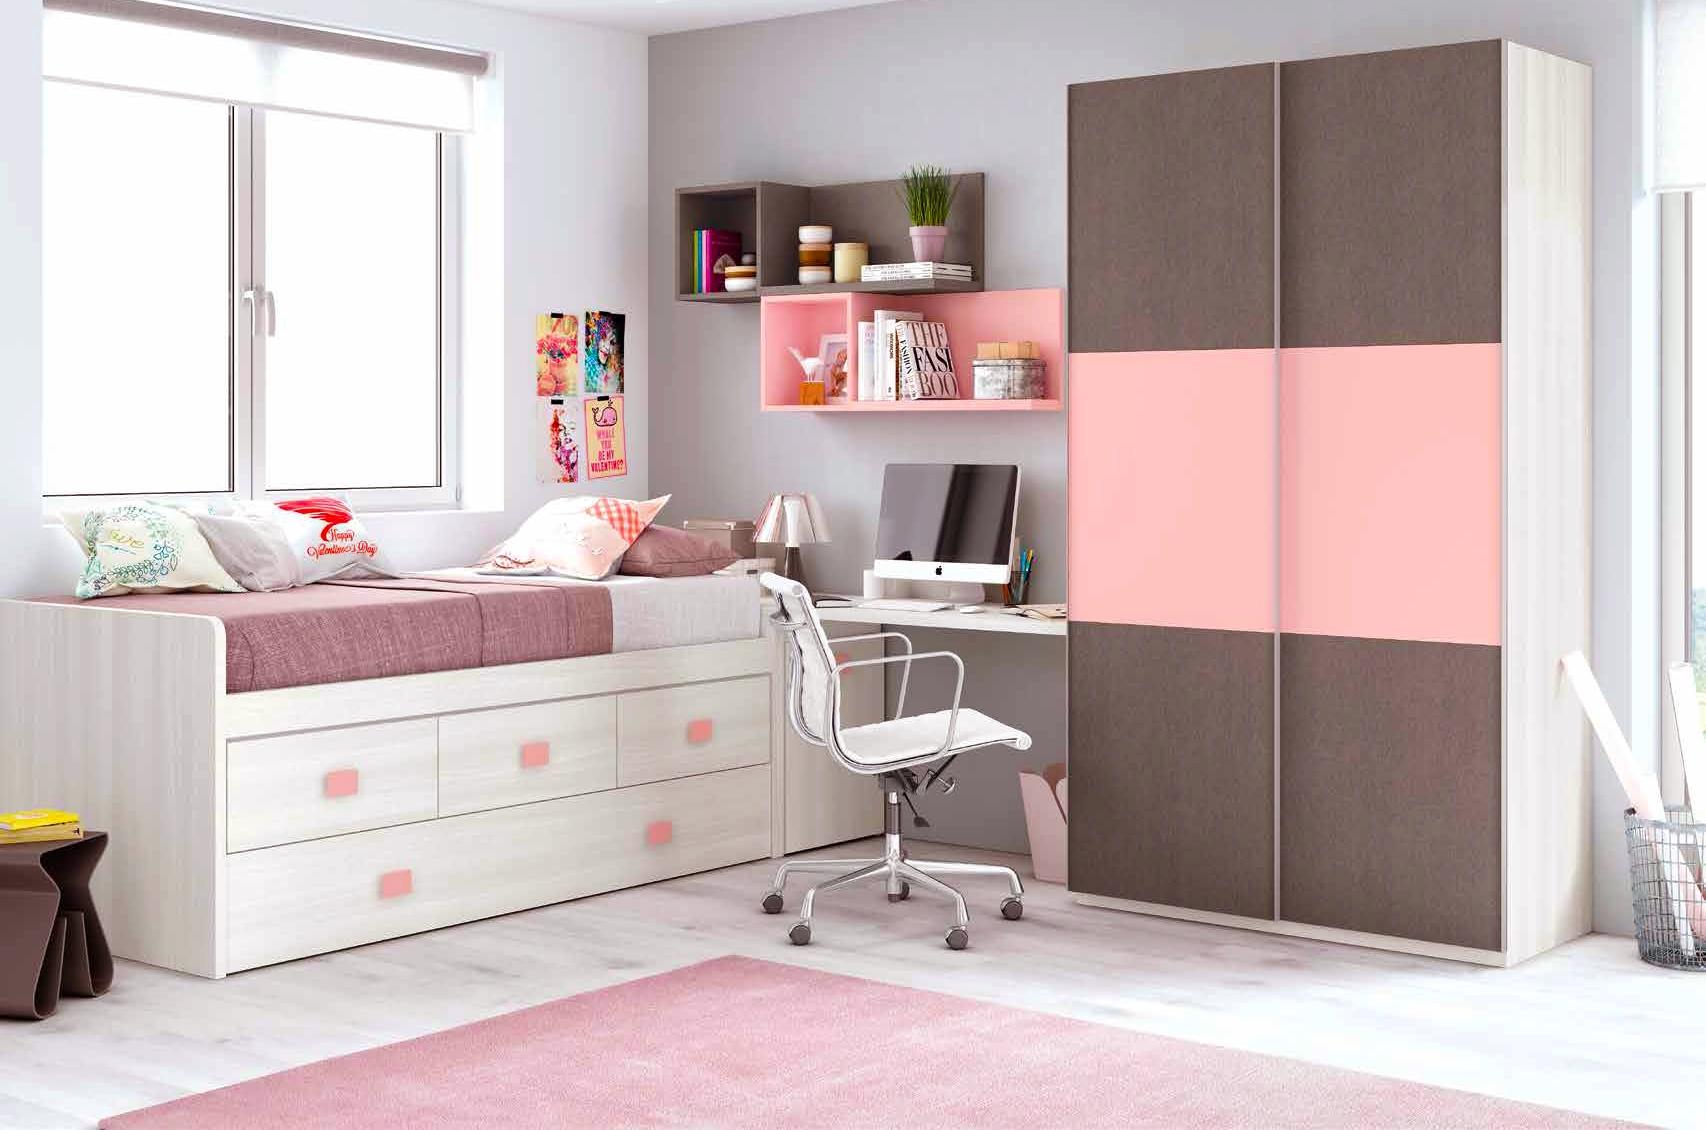 Chambre fille rose composition L008 avec lit gigogne - GLICERIO